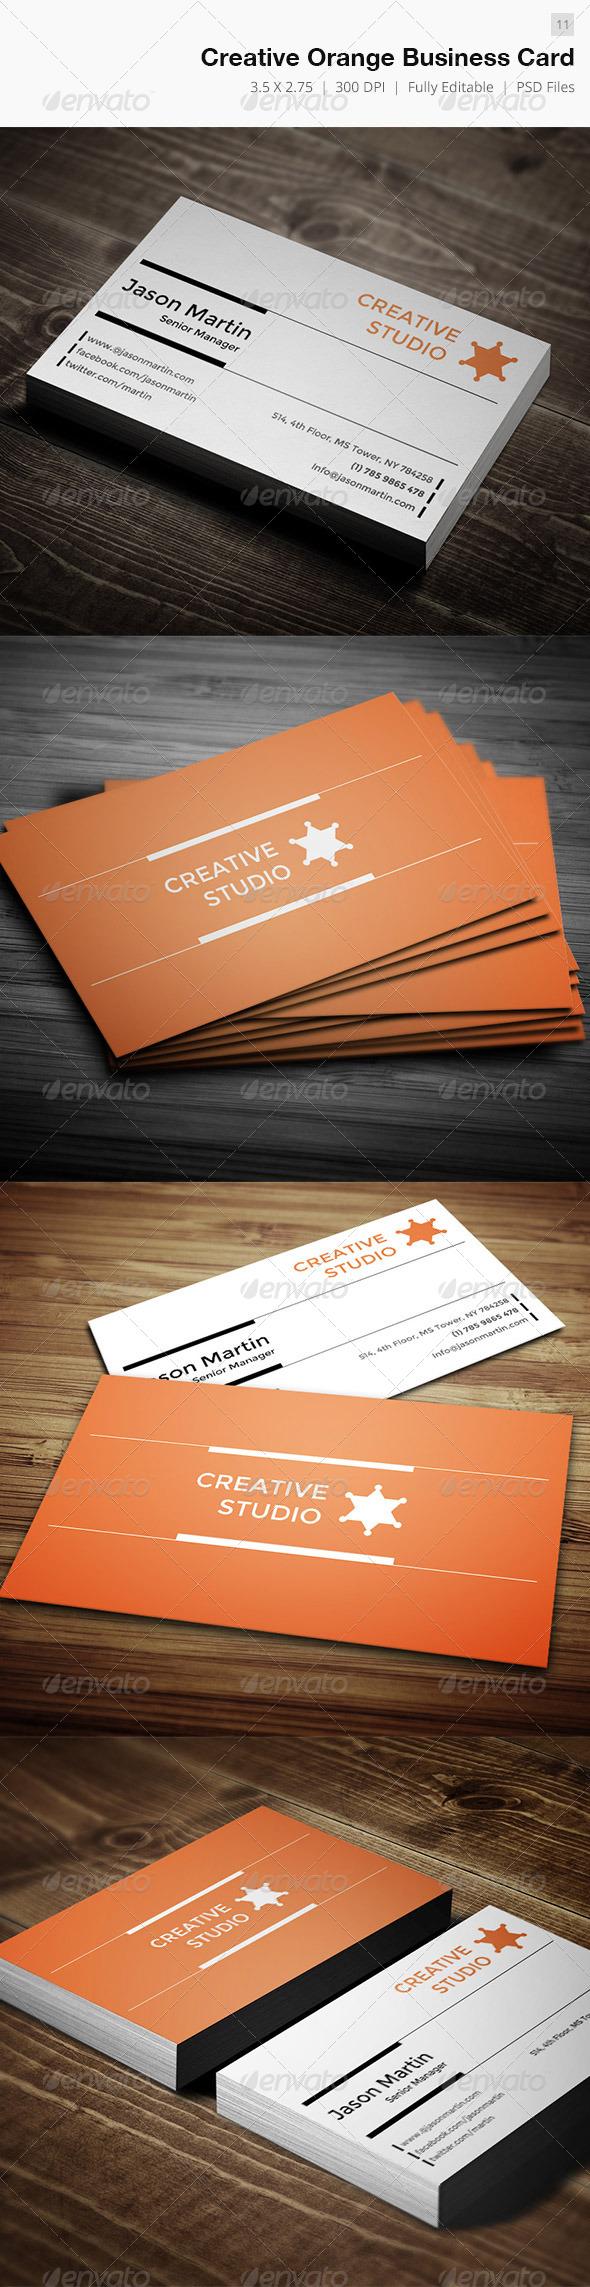 GraphicRiver Creative Orange Business Card 4558763